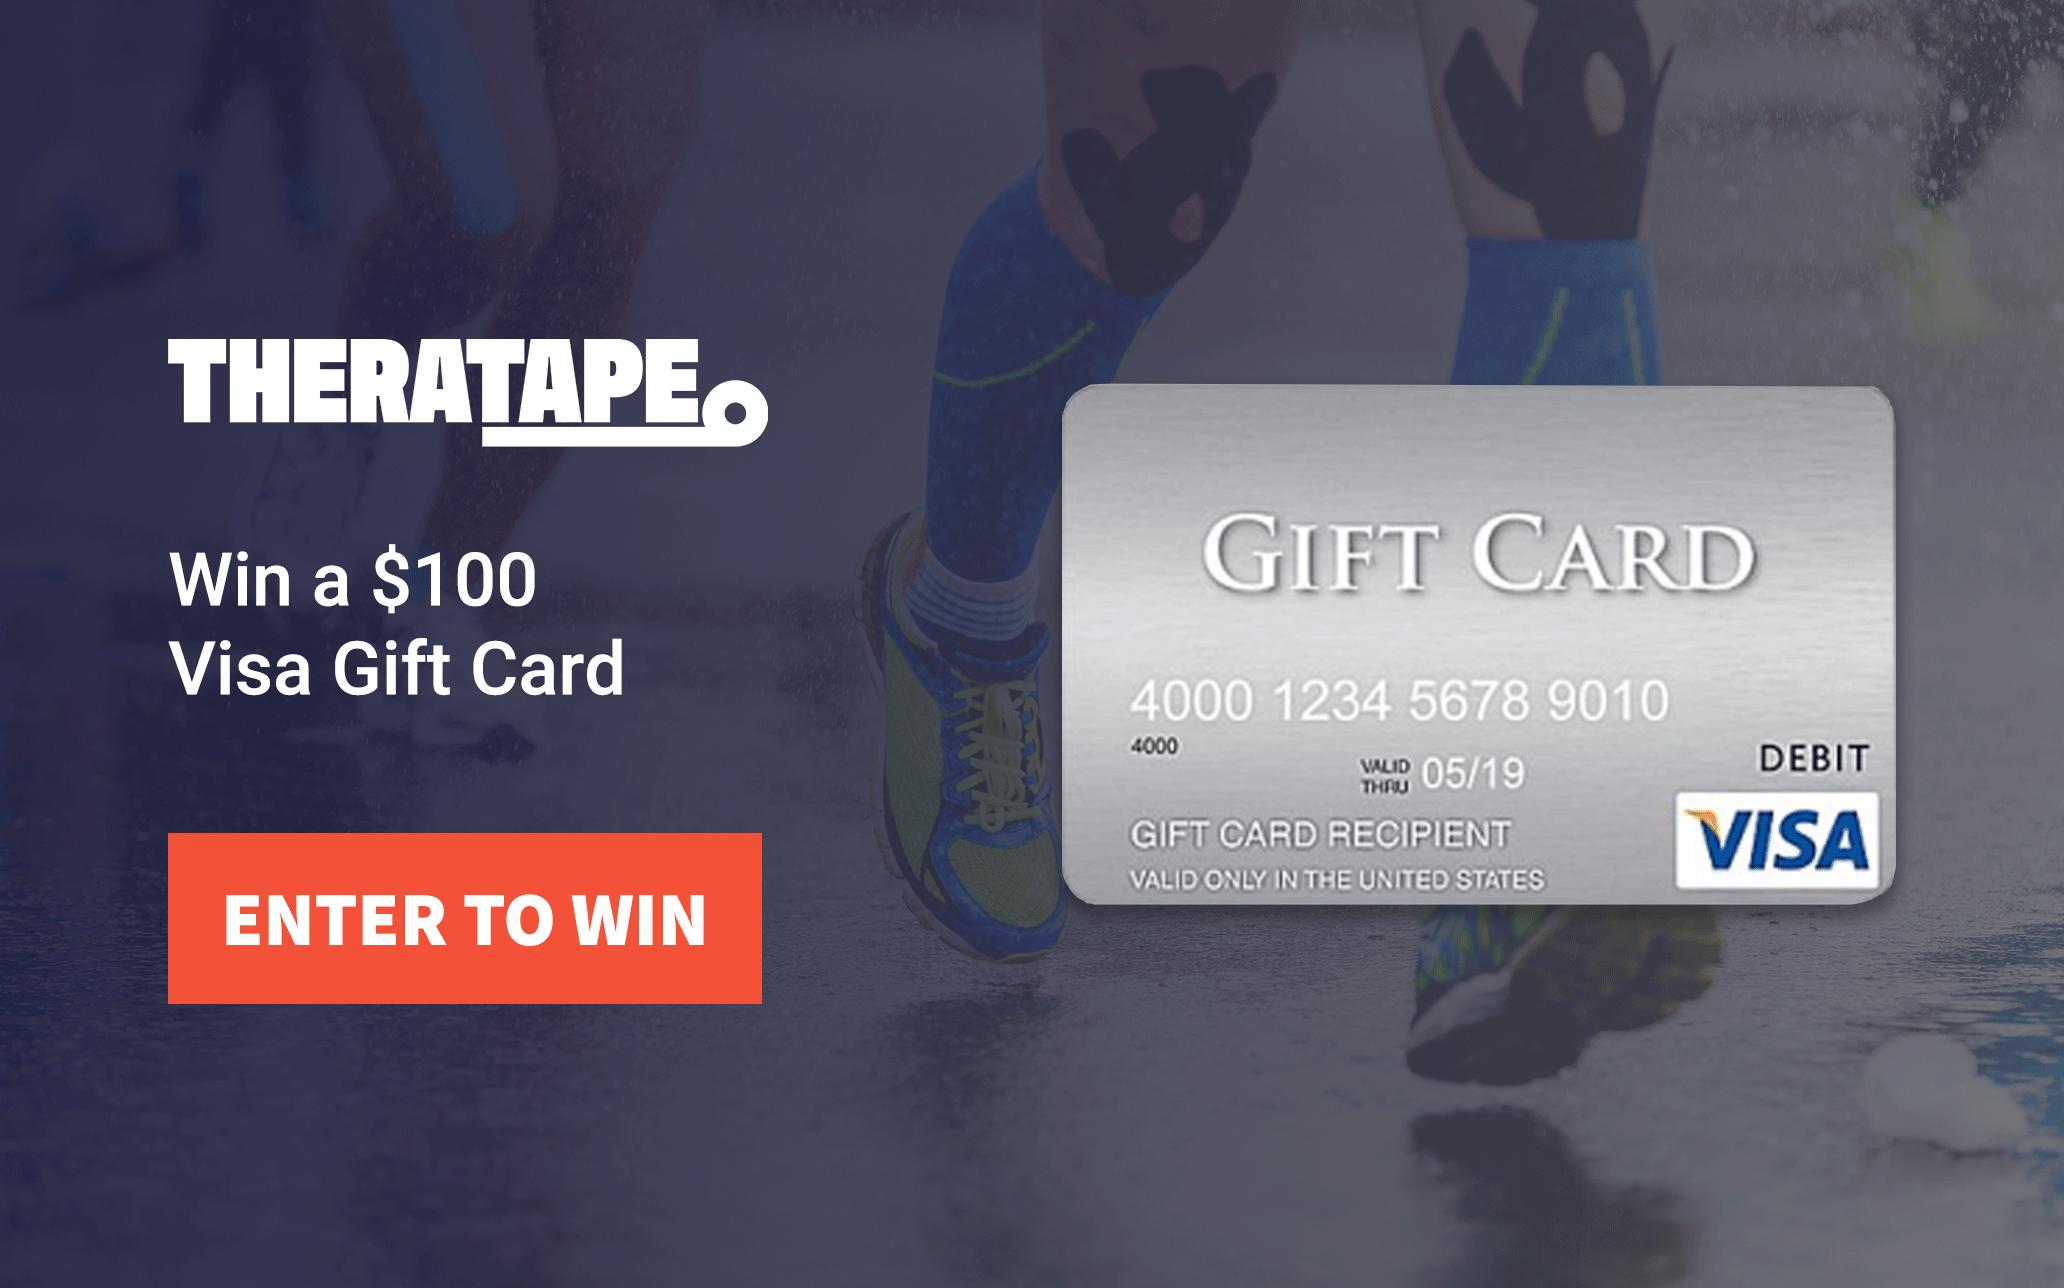 Theratape 0 Visa Gift Card Giveaway